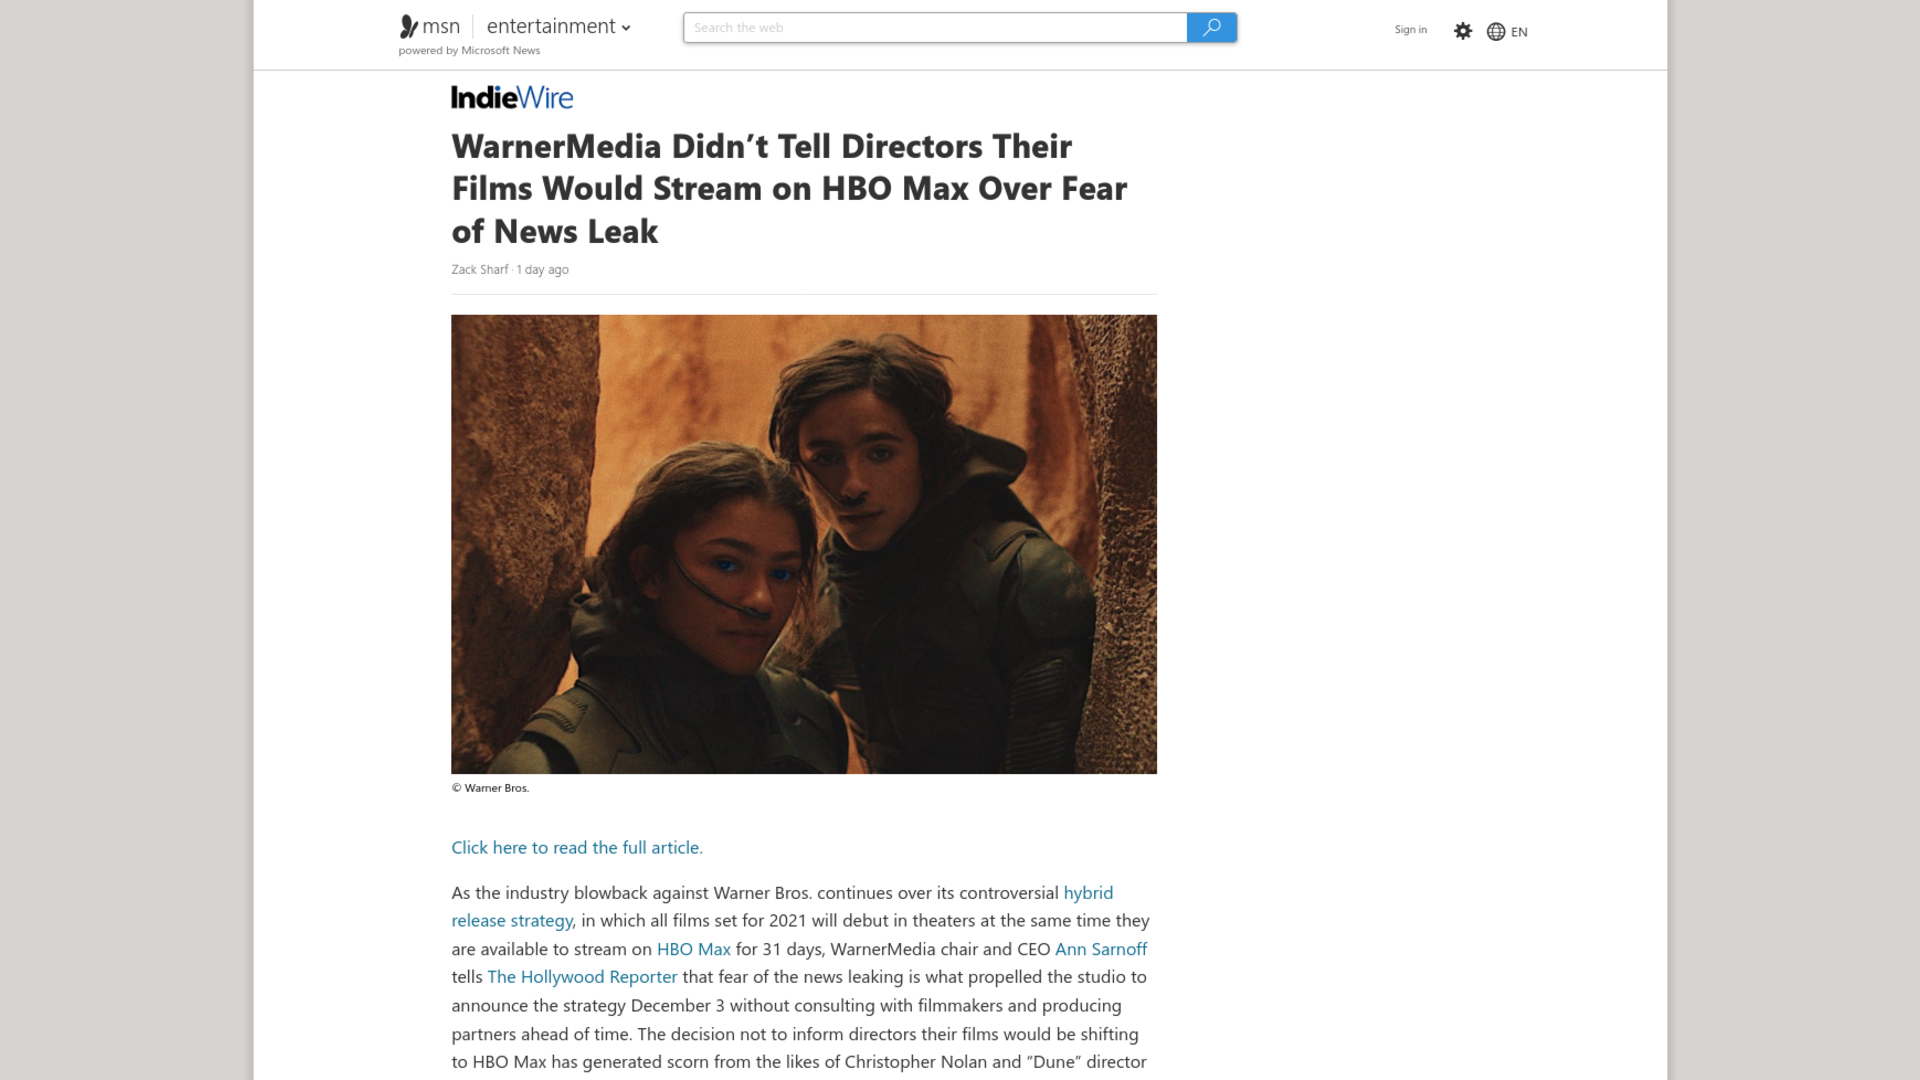 Fairness Rocks News WarnerMedia Didn't Tell Directors Their Films Would Stream on HBO Max Over Fear of News Leak